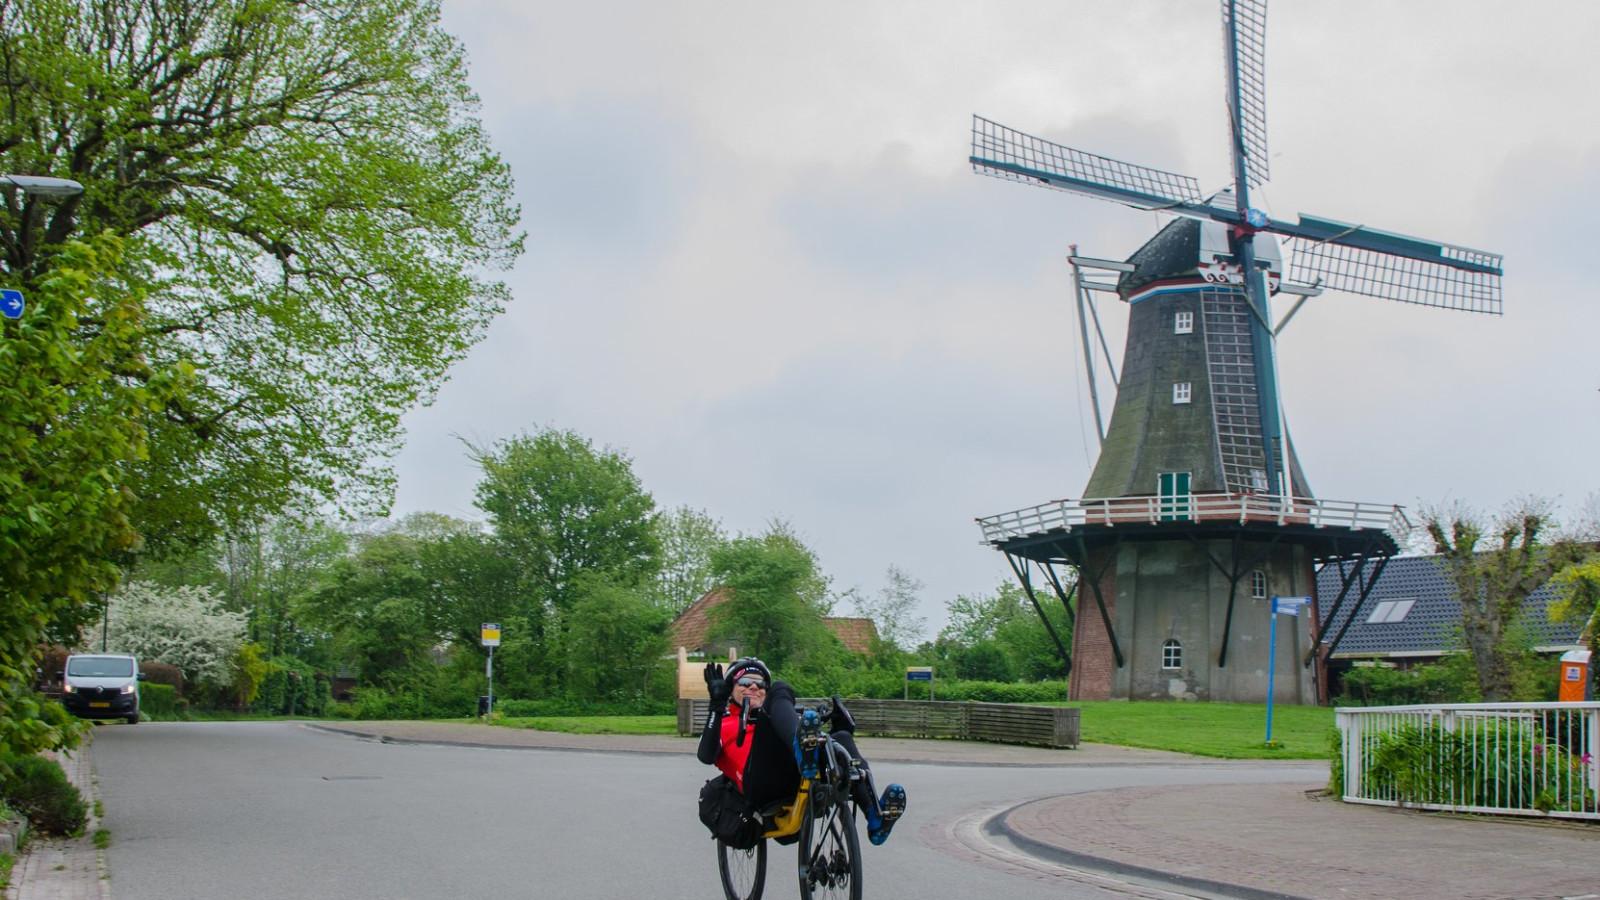 Bikes of Race Around The Netherlands